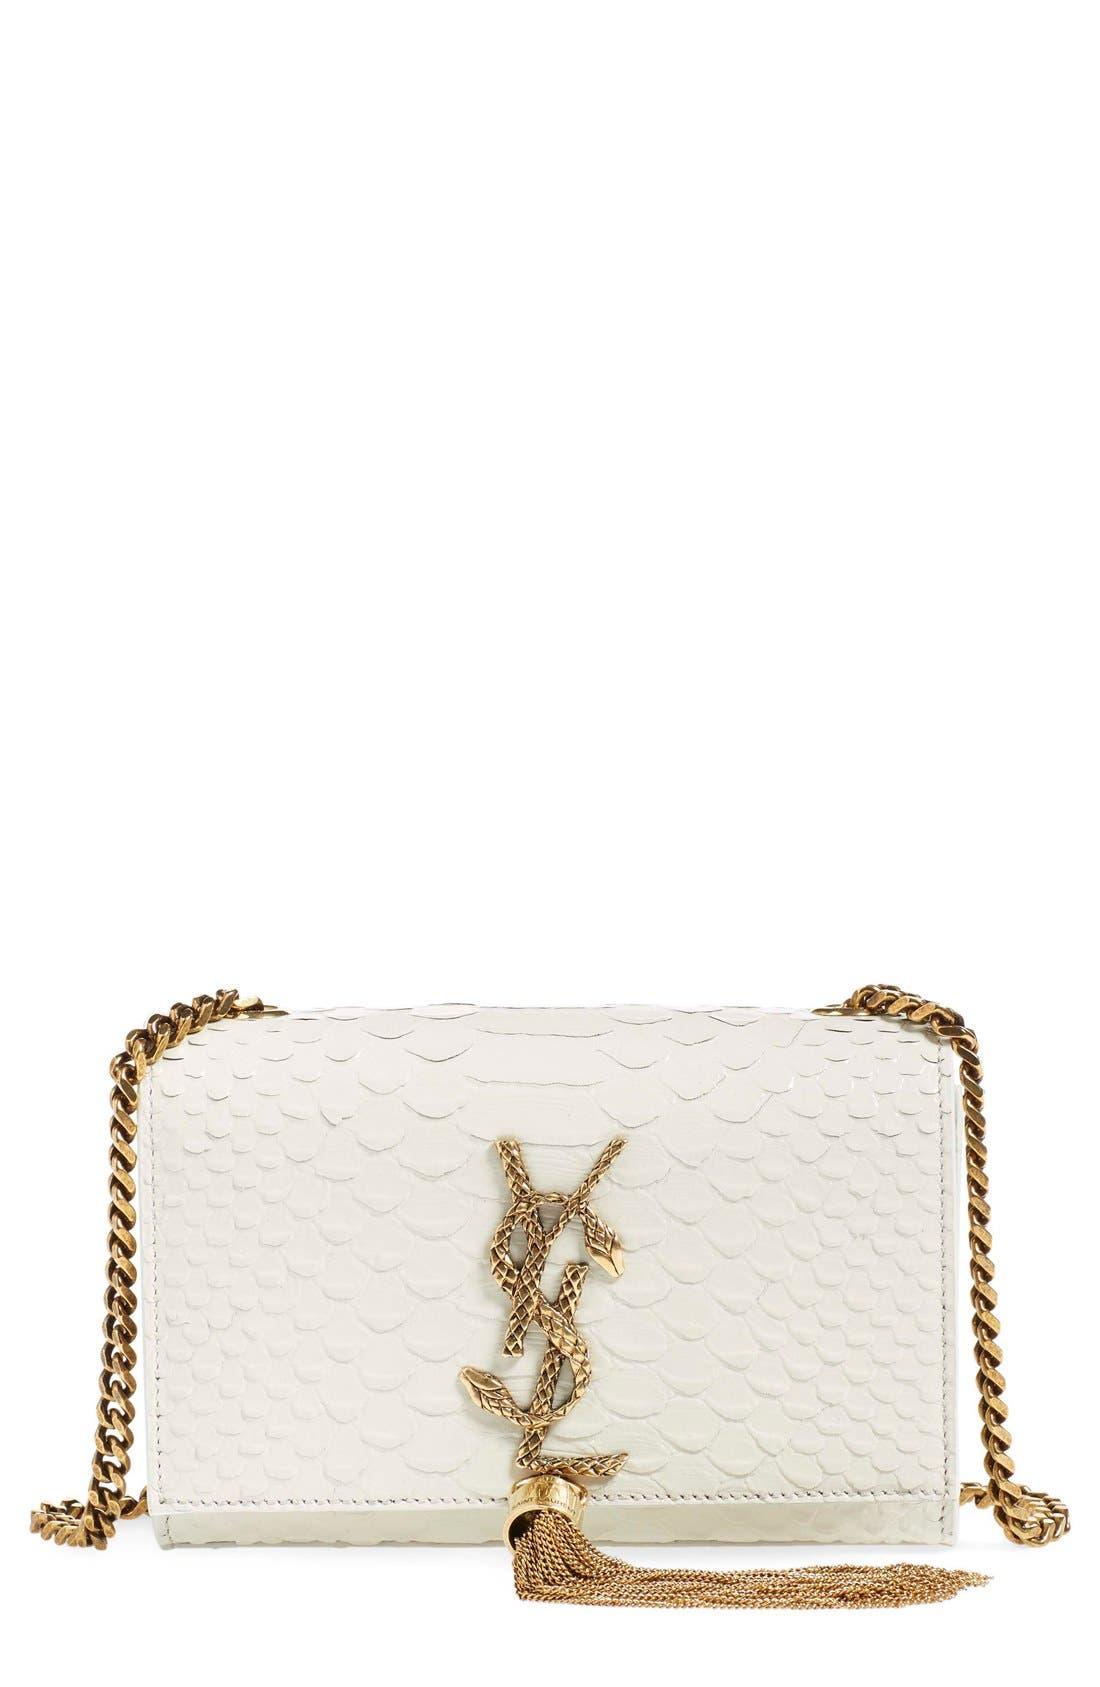 Main Image - Saint Laurent 'Mini Monogram - Serpent' Tassel Crossbody Bag